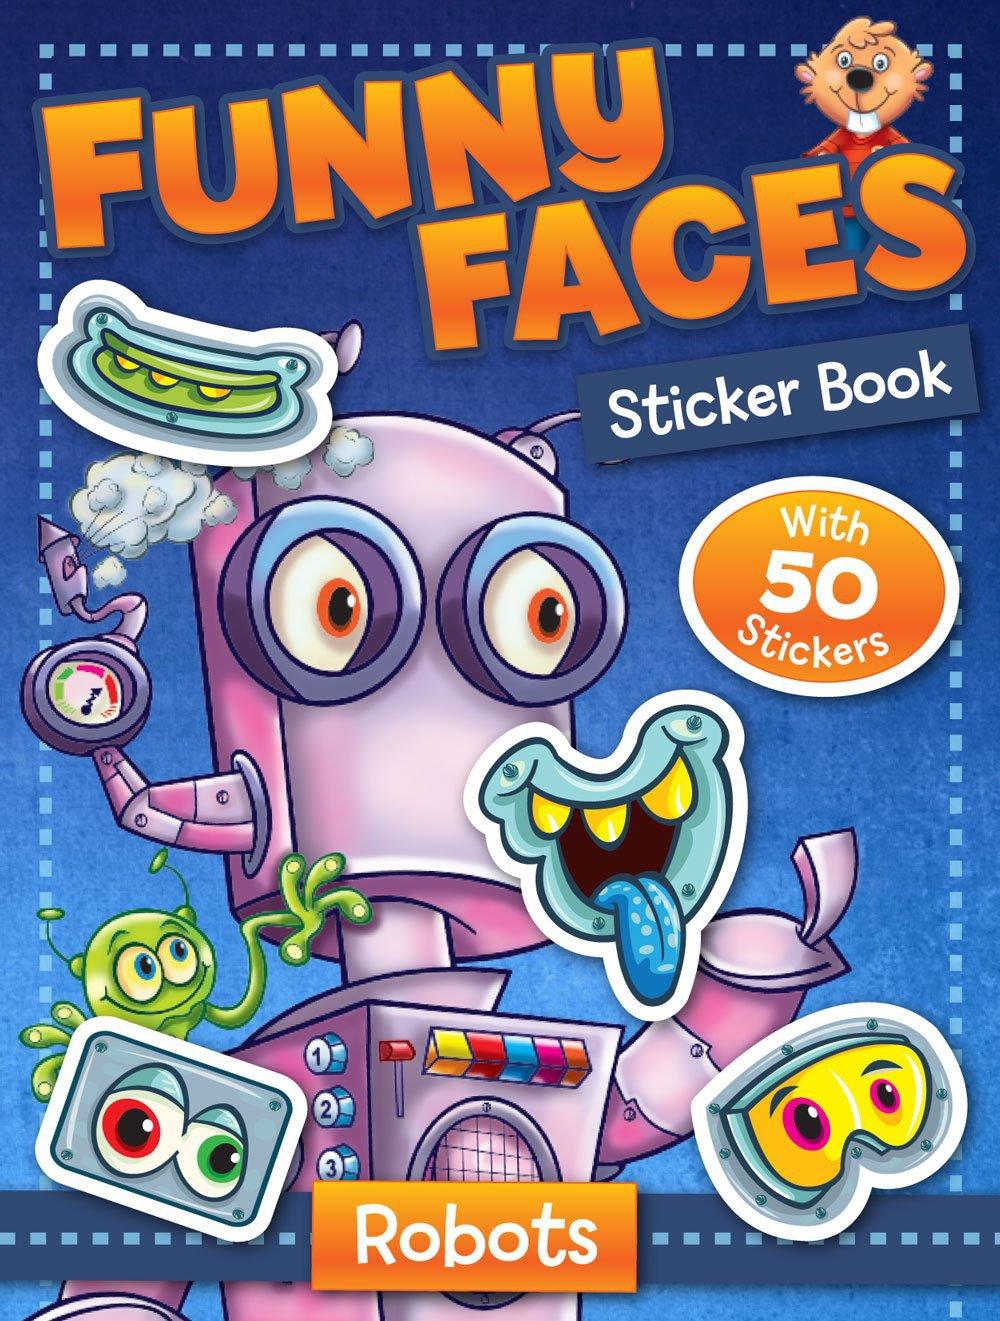 Funny Faces Sticker Book: Robots (Funny Faces Sticker Books)